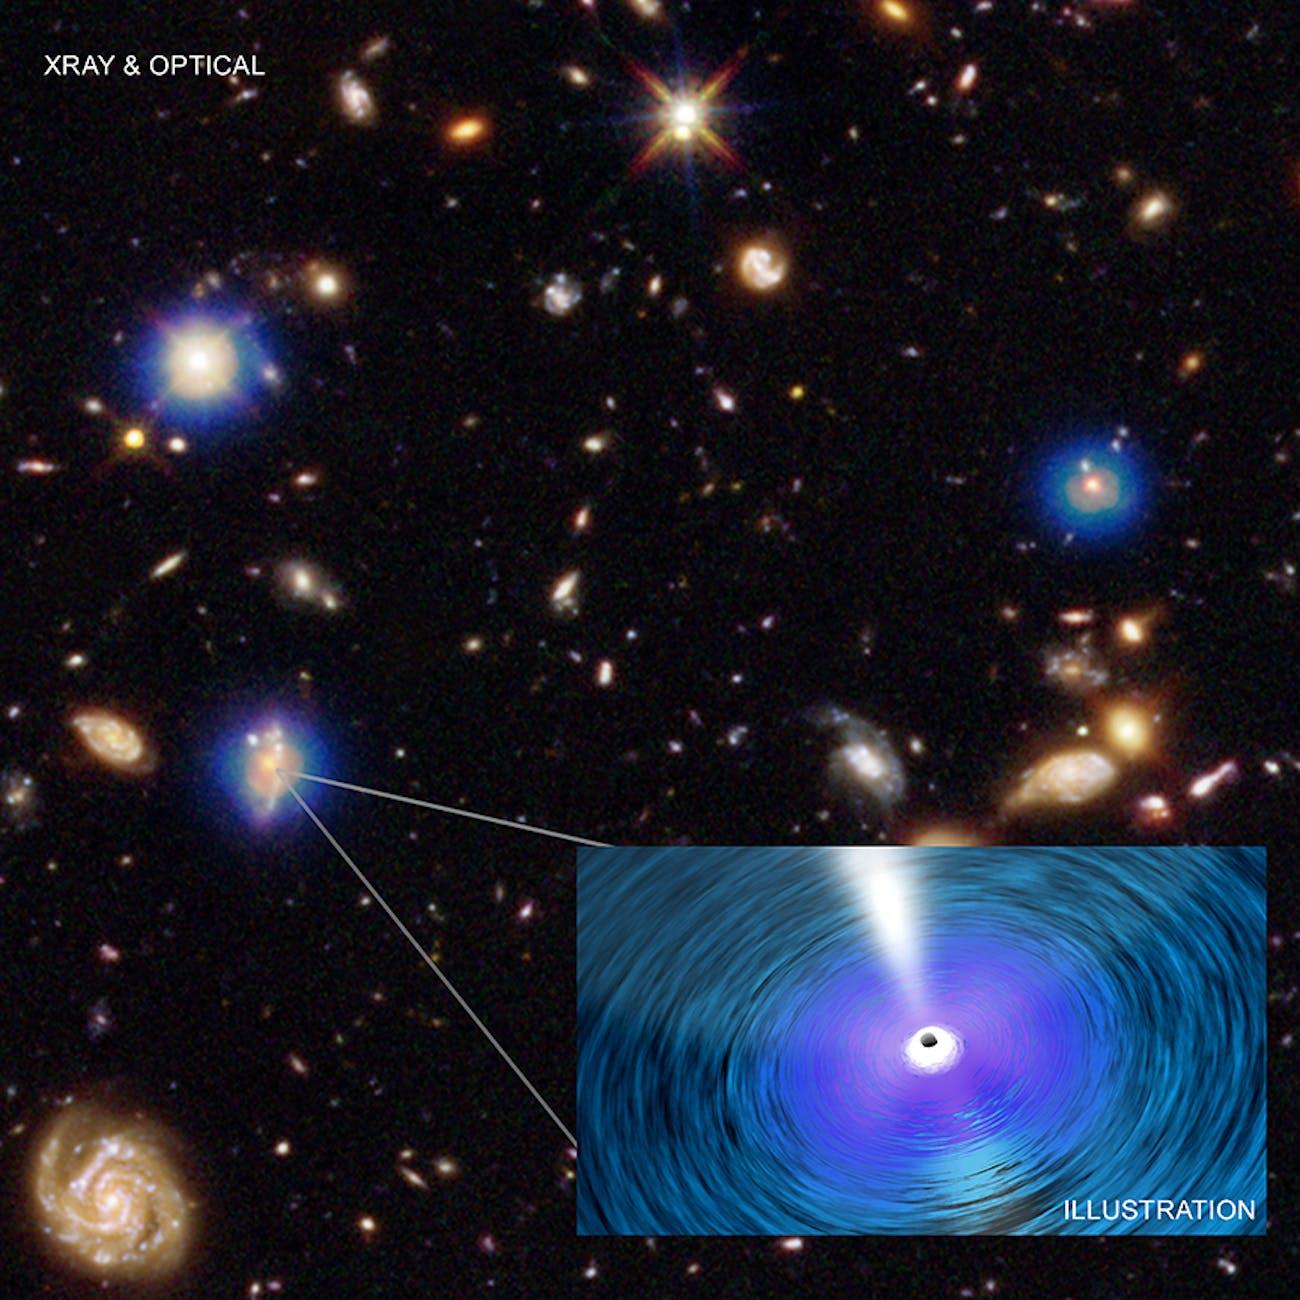 Chandra X-ray Observatory's Deep Field South